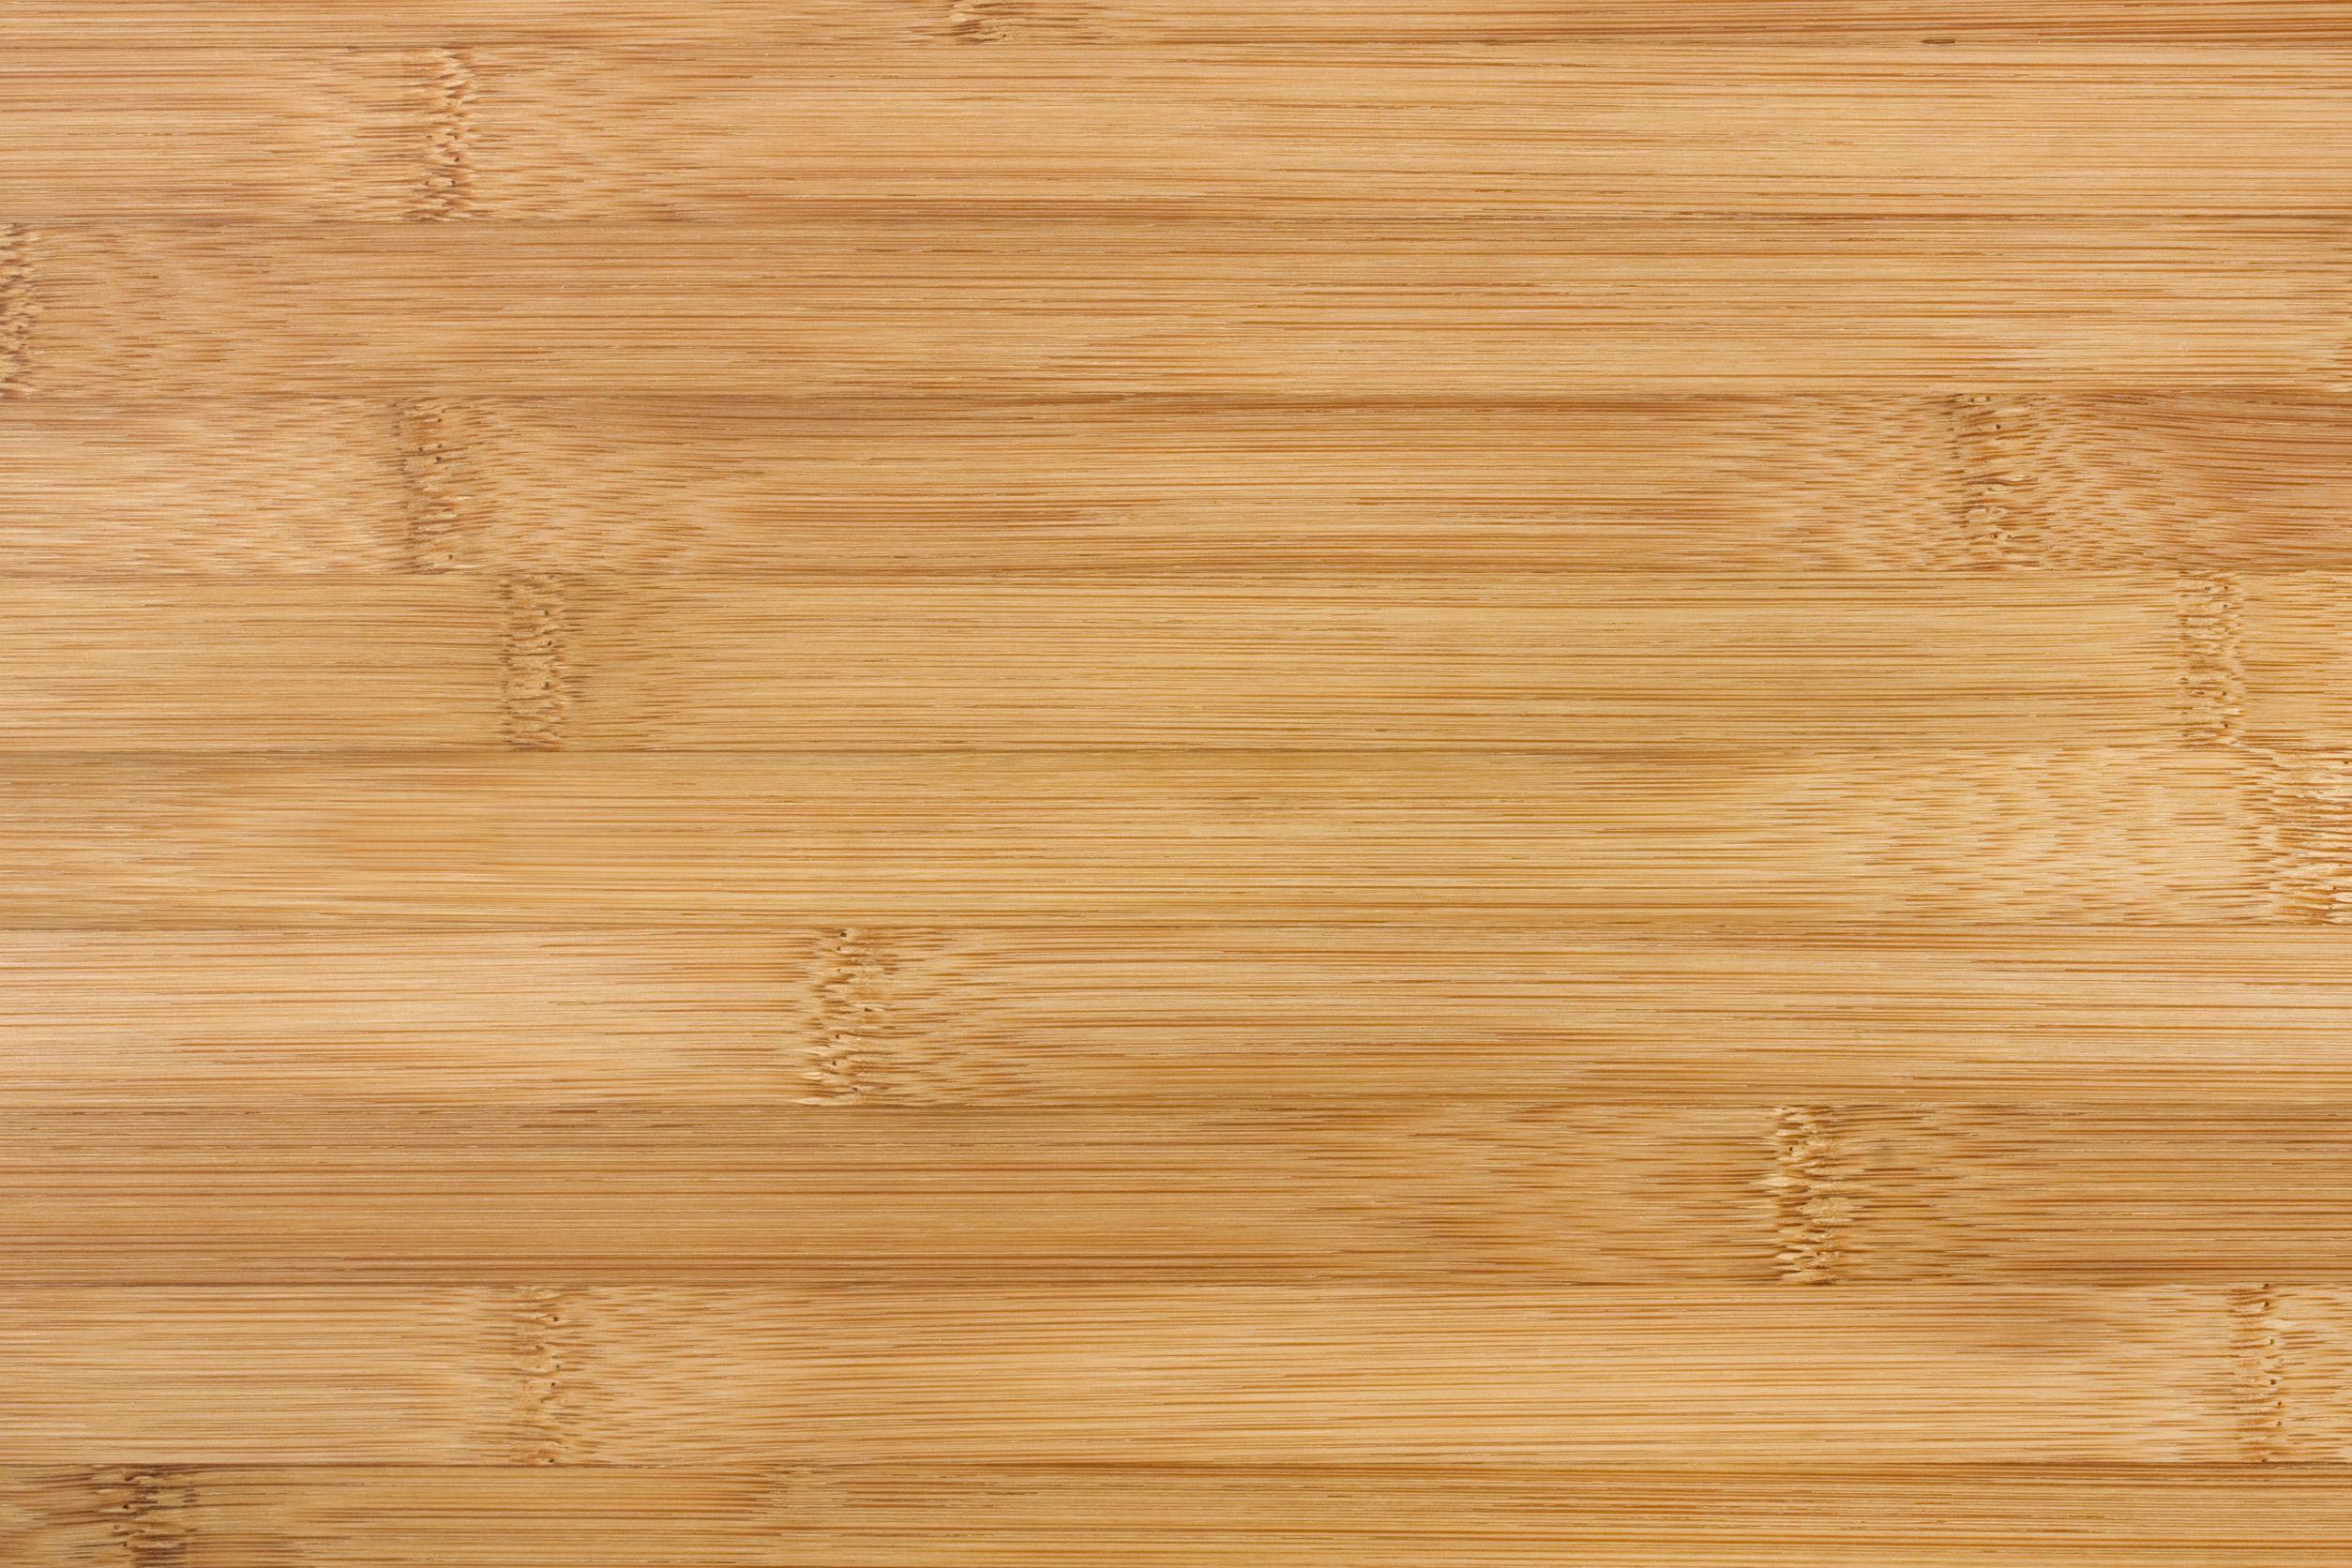 9074647  bamboo wood background texture  WoodFloorDoctorcom